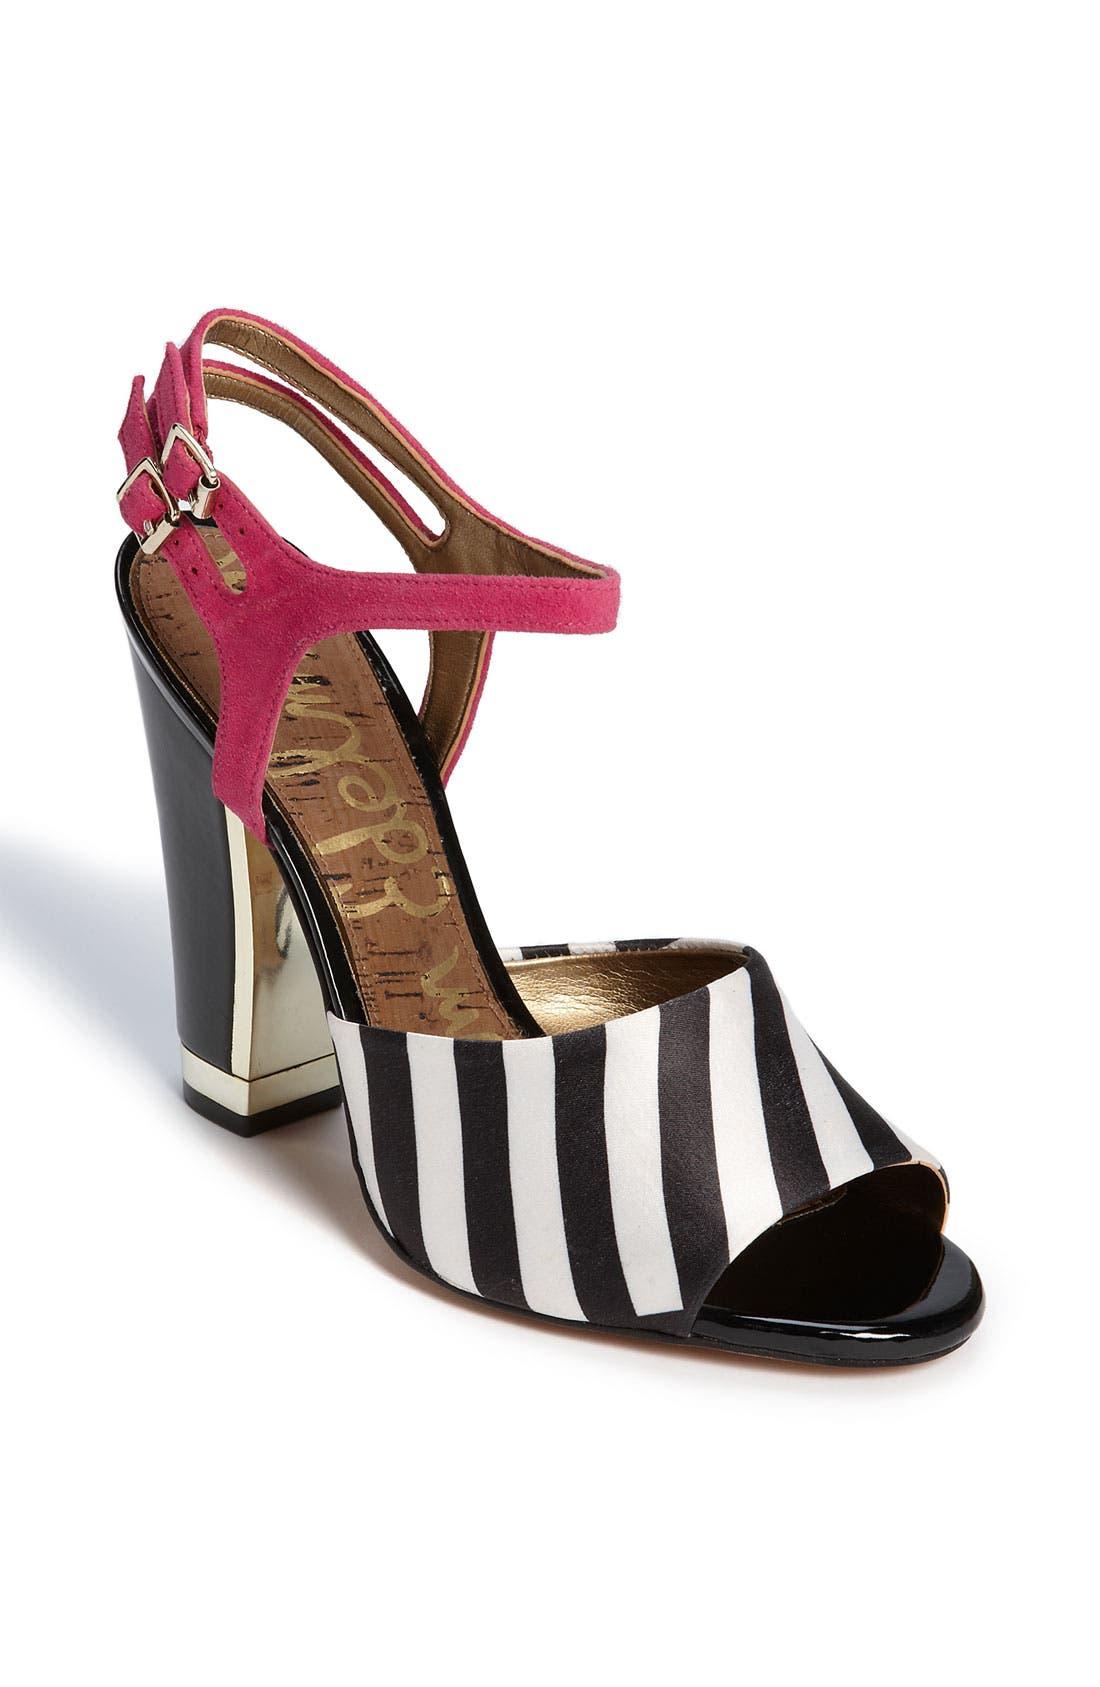 Main Image - Sam Edelman 'Odetta' Sandal